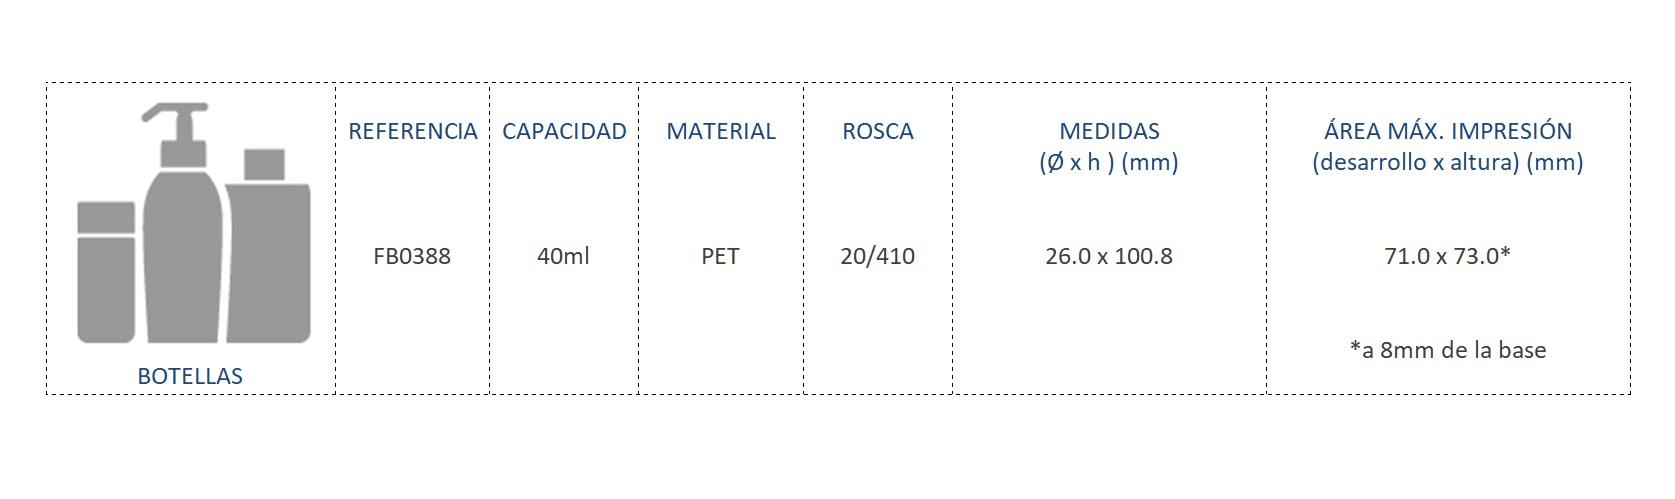 Cuadro de materiales FB0388